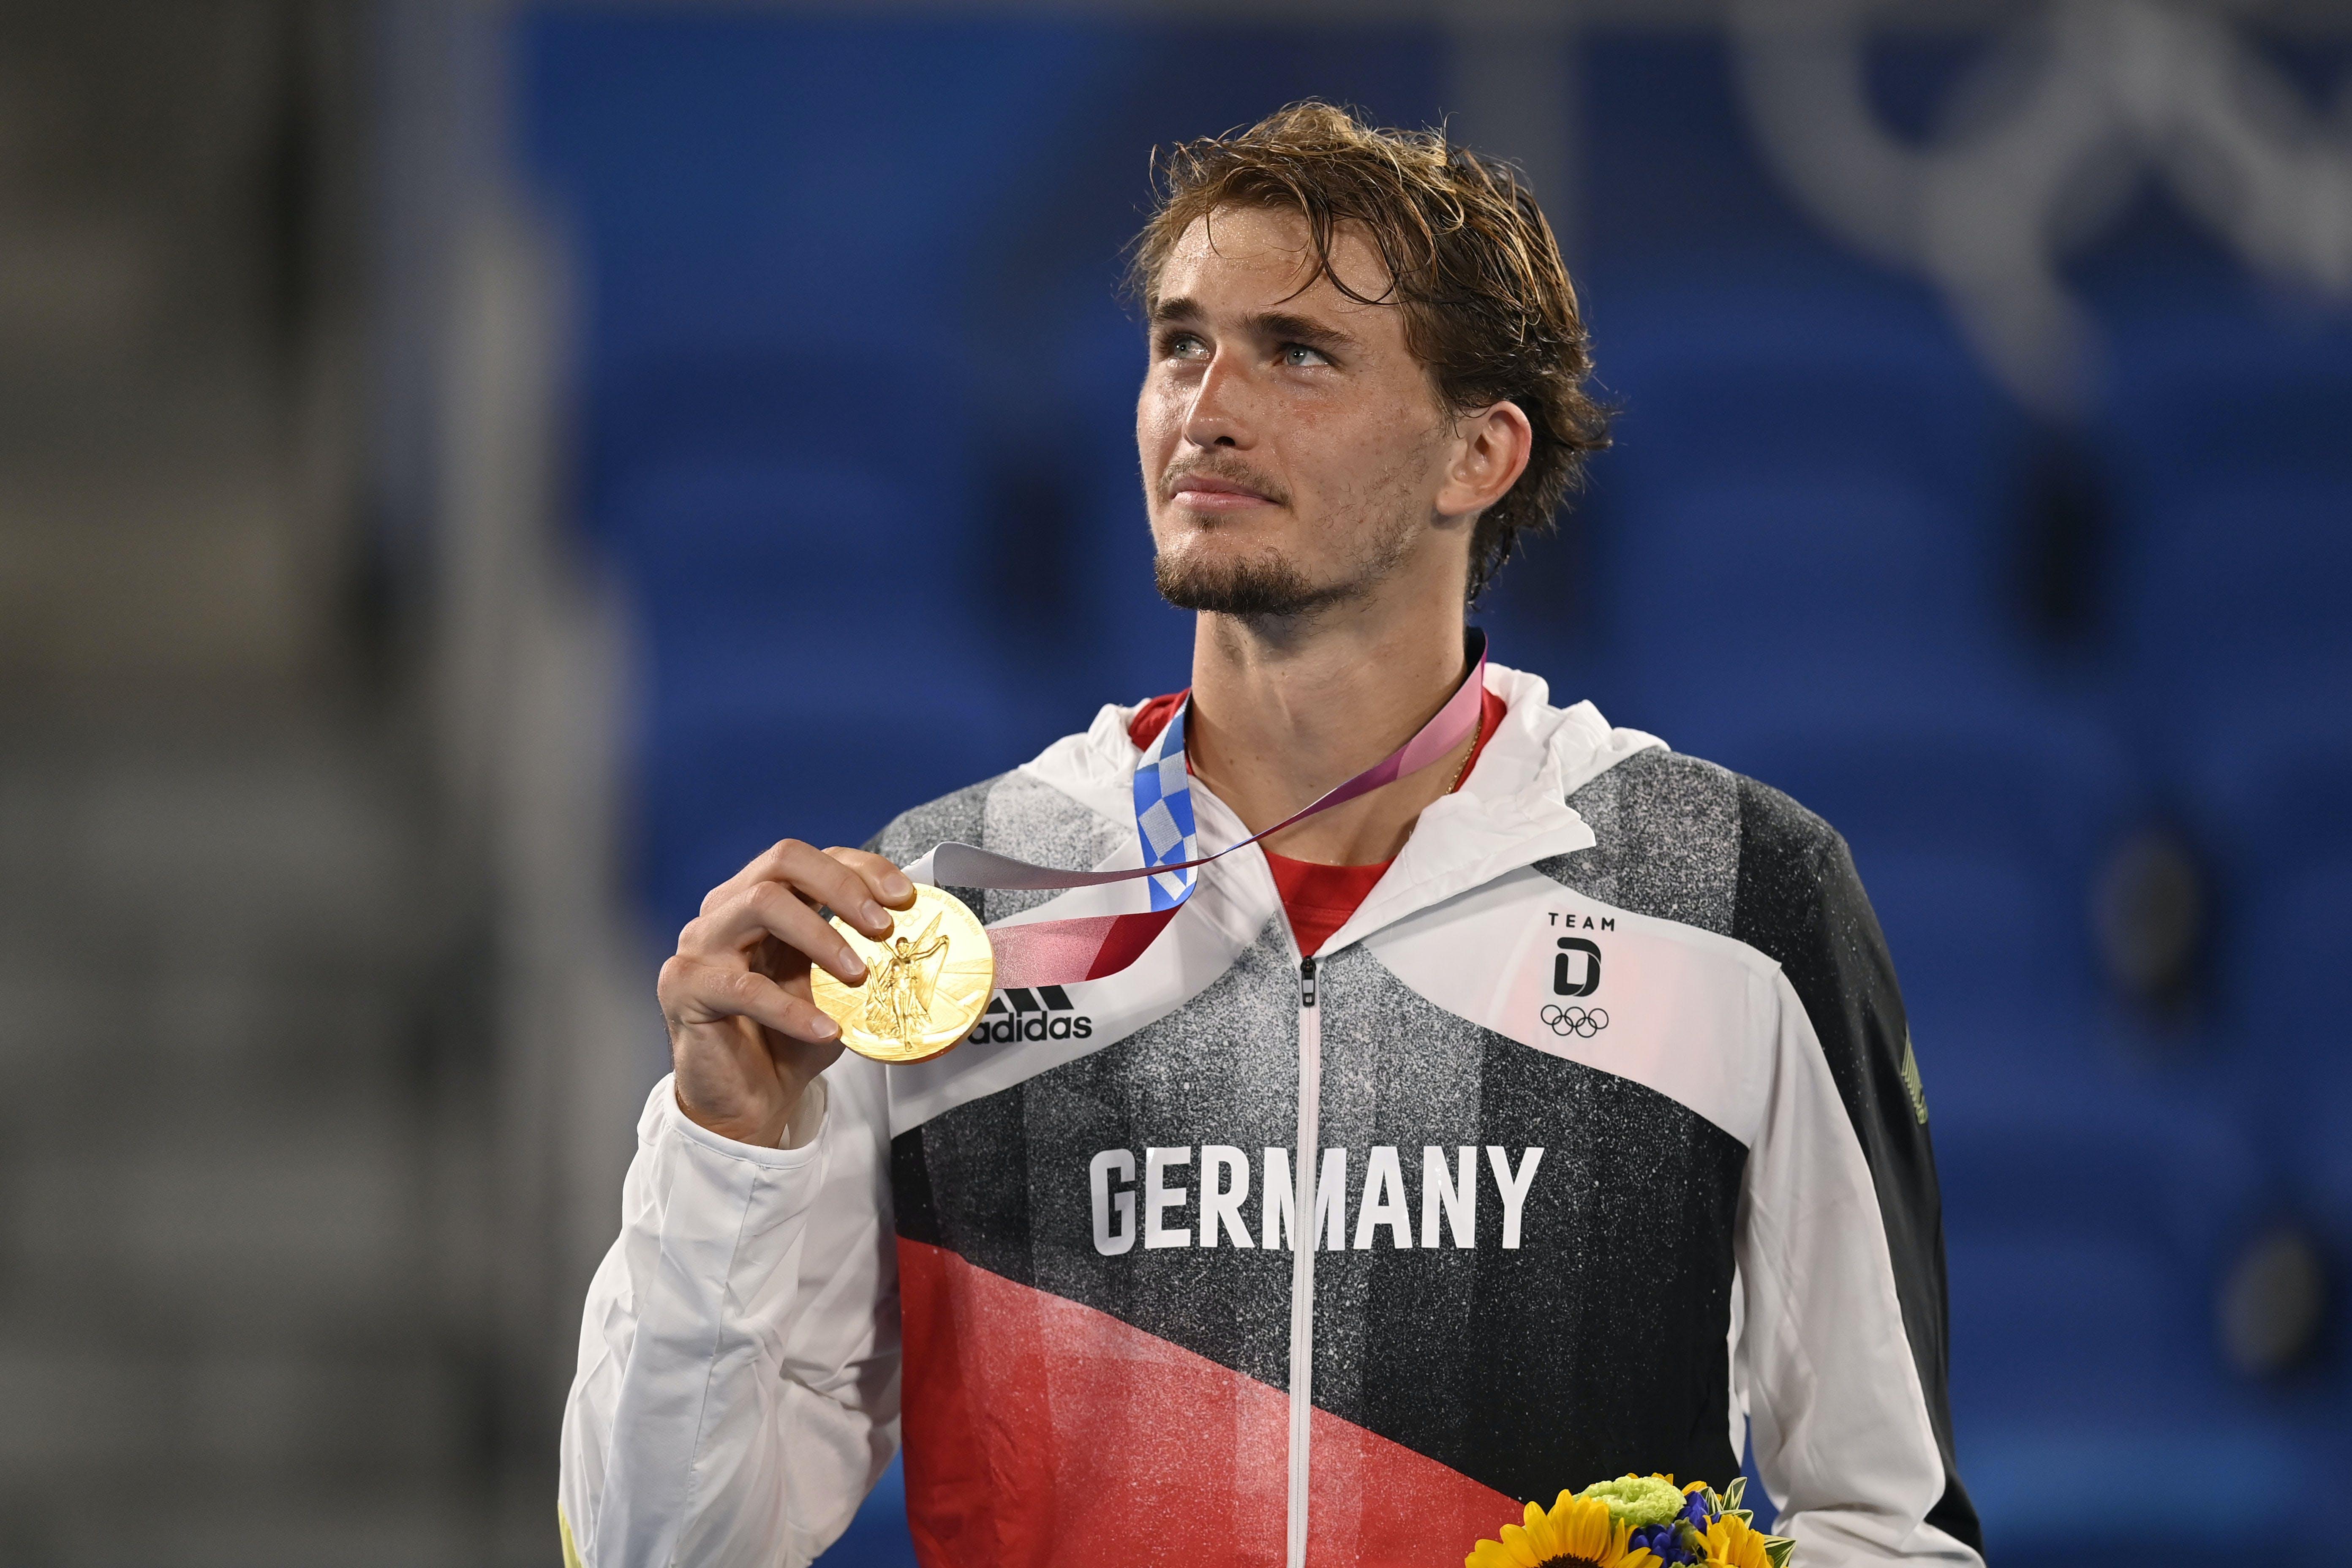 Alexander Zverev / Médaille d'or Tokyo 2020